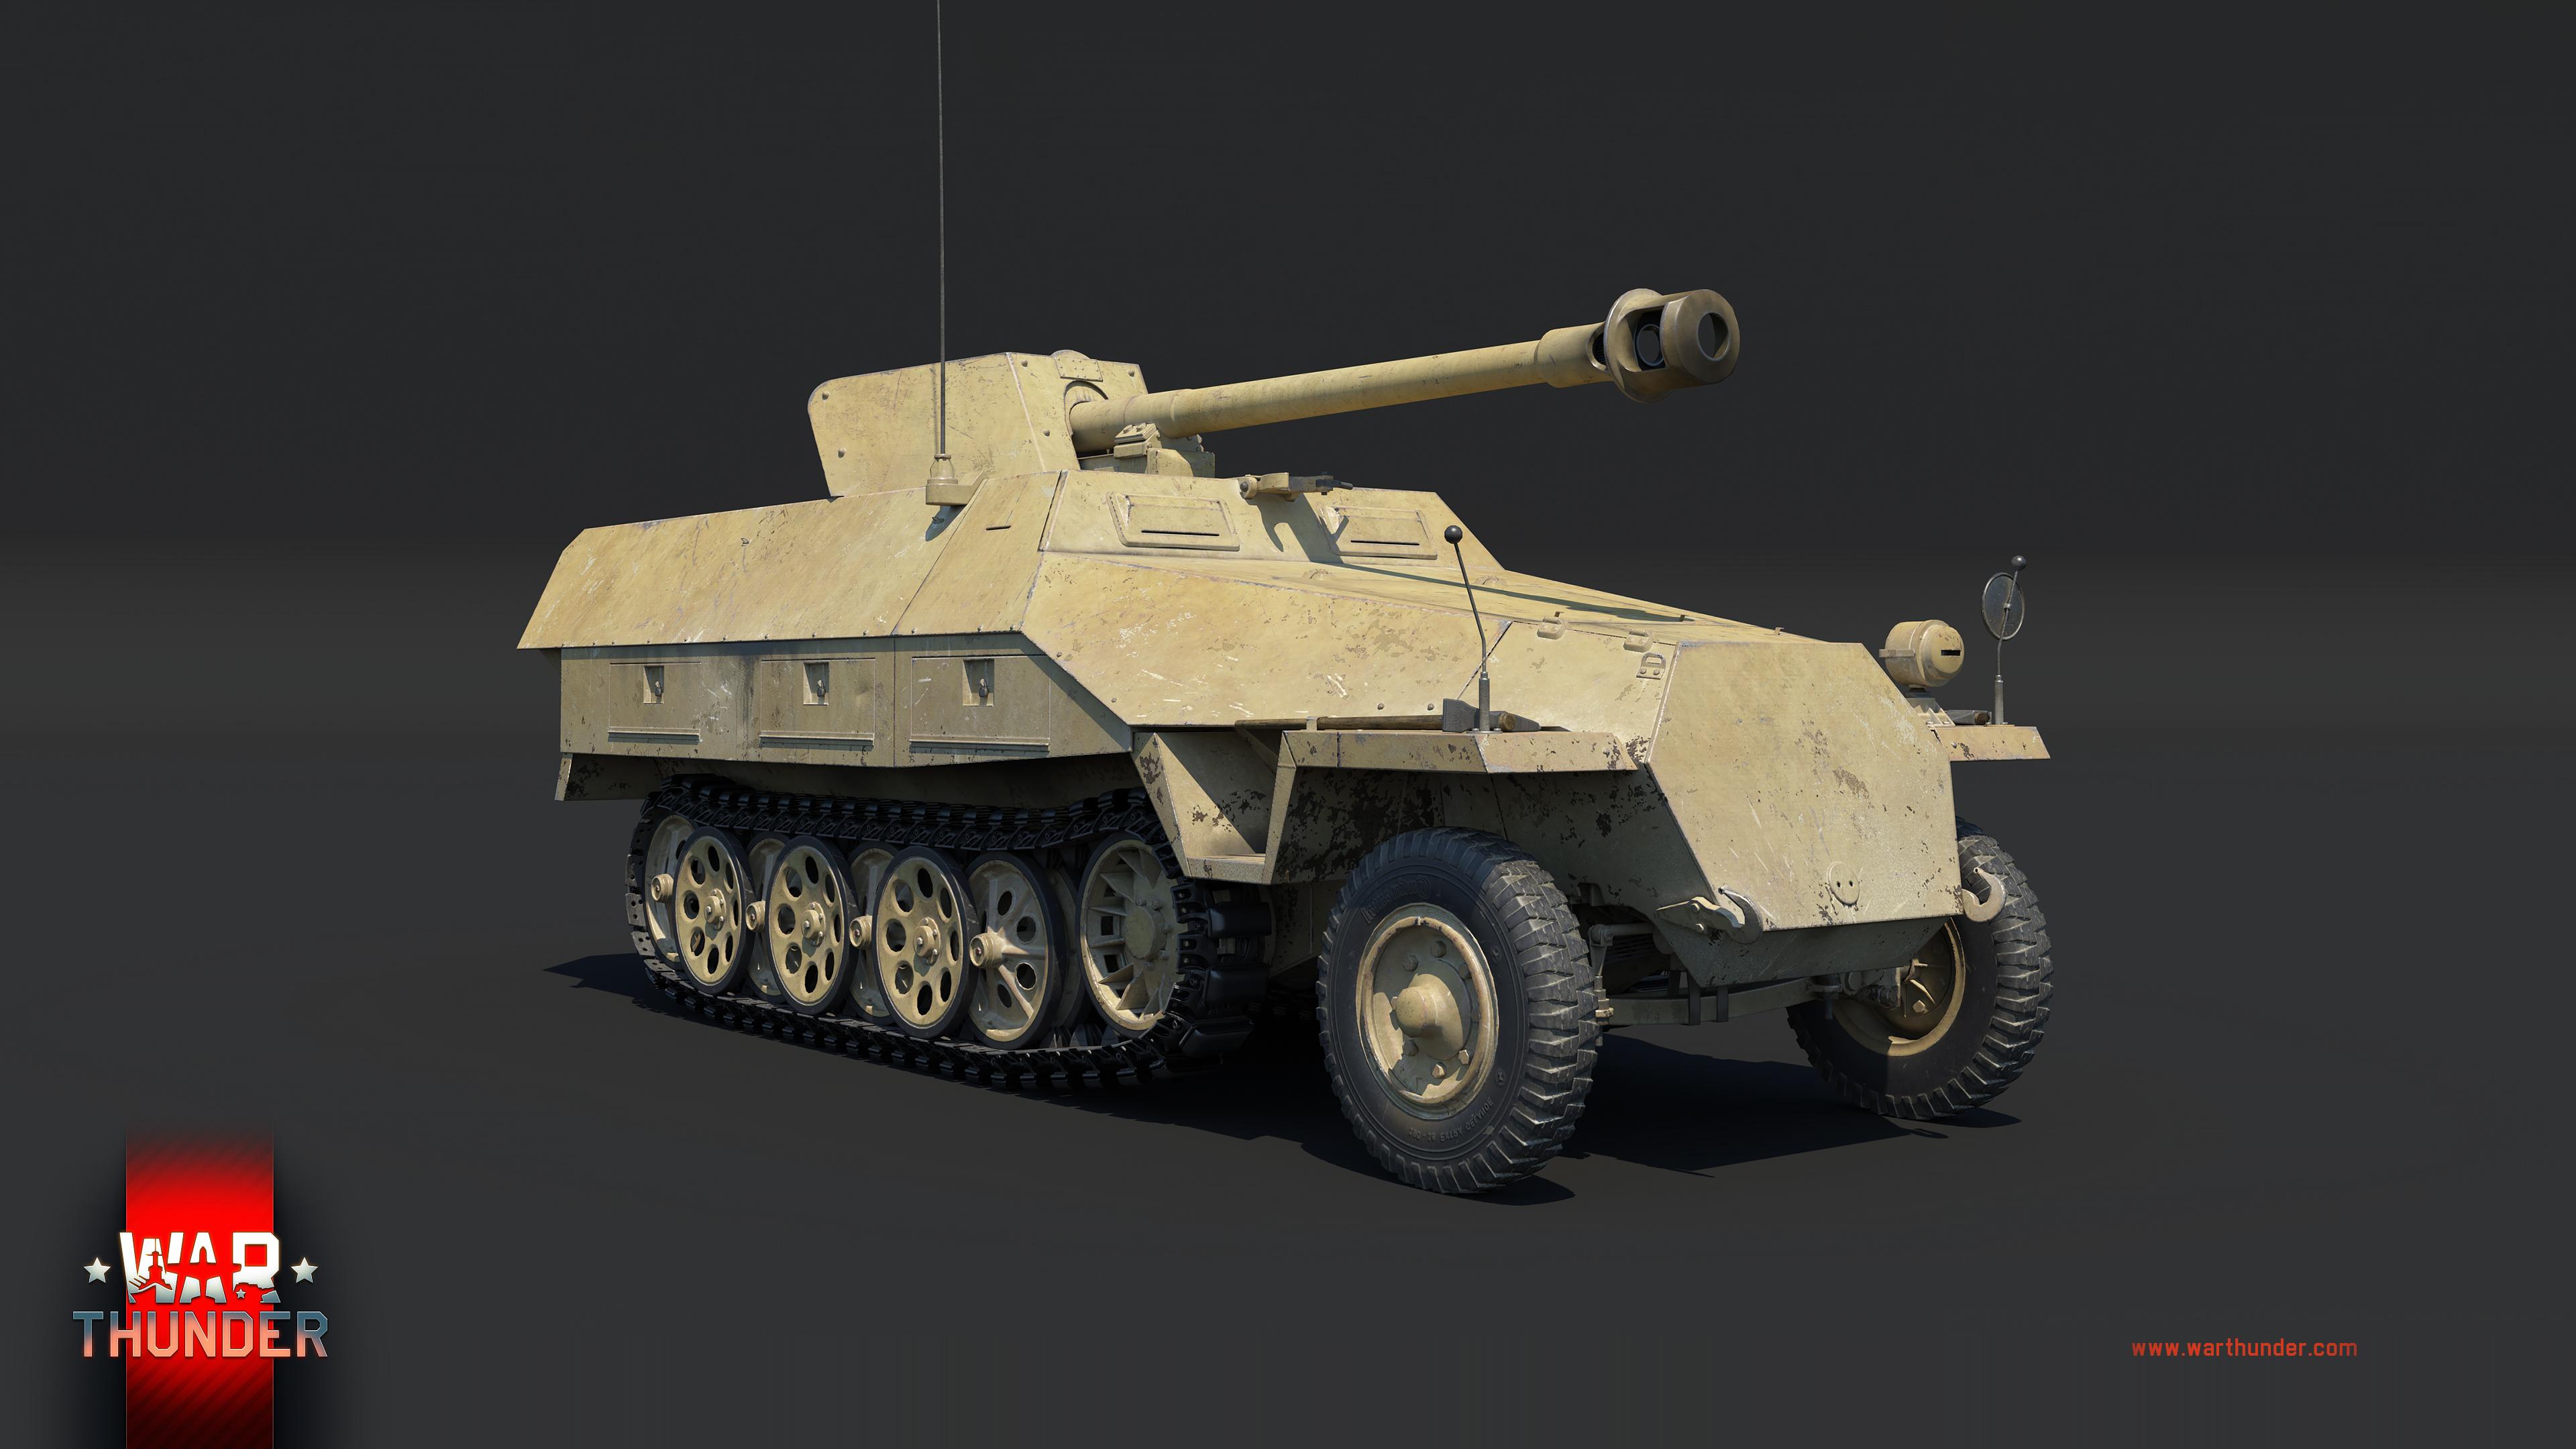 Thunder tanks war german War Thunder: